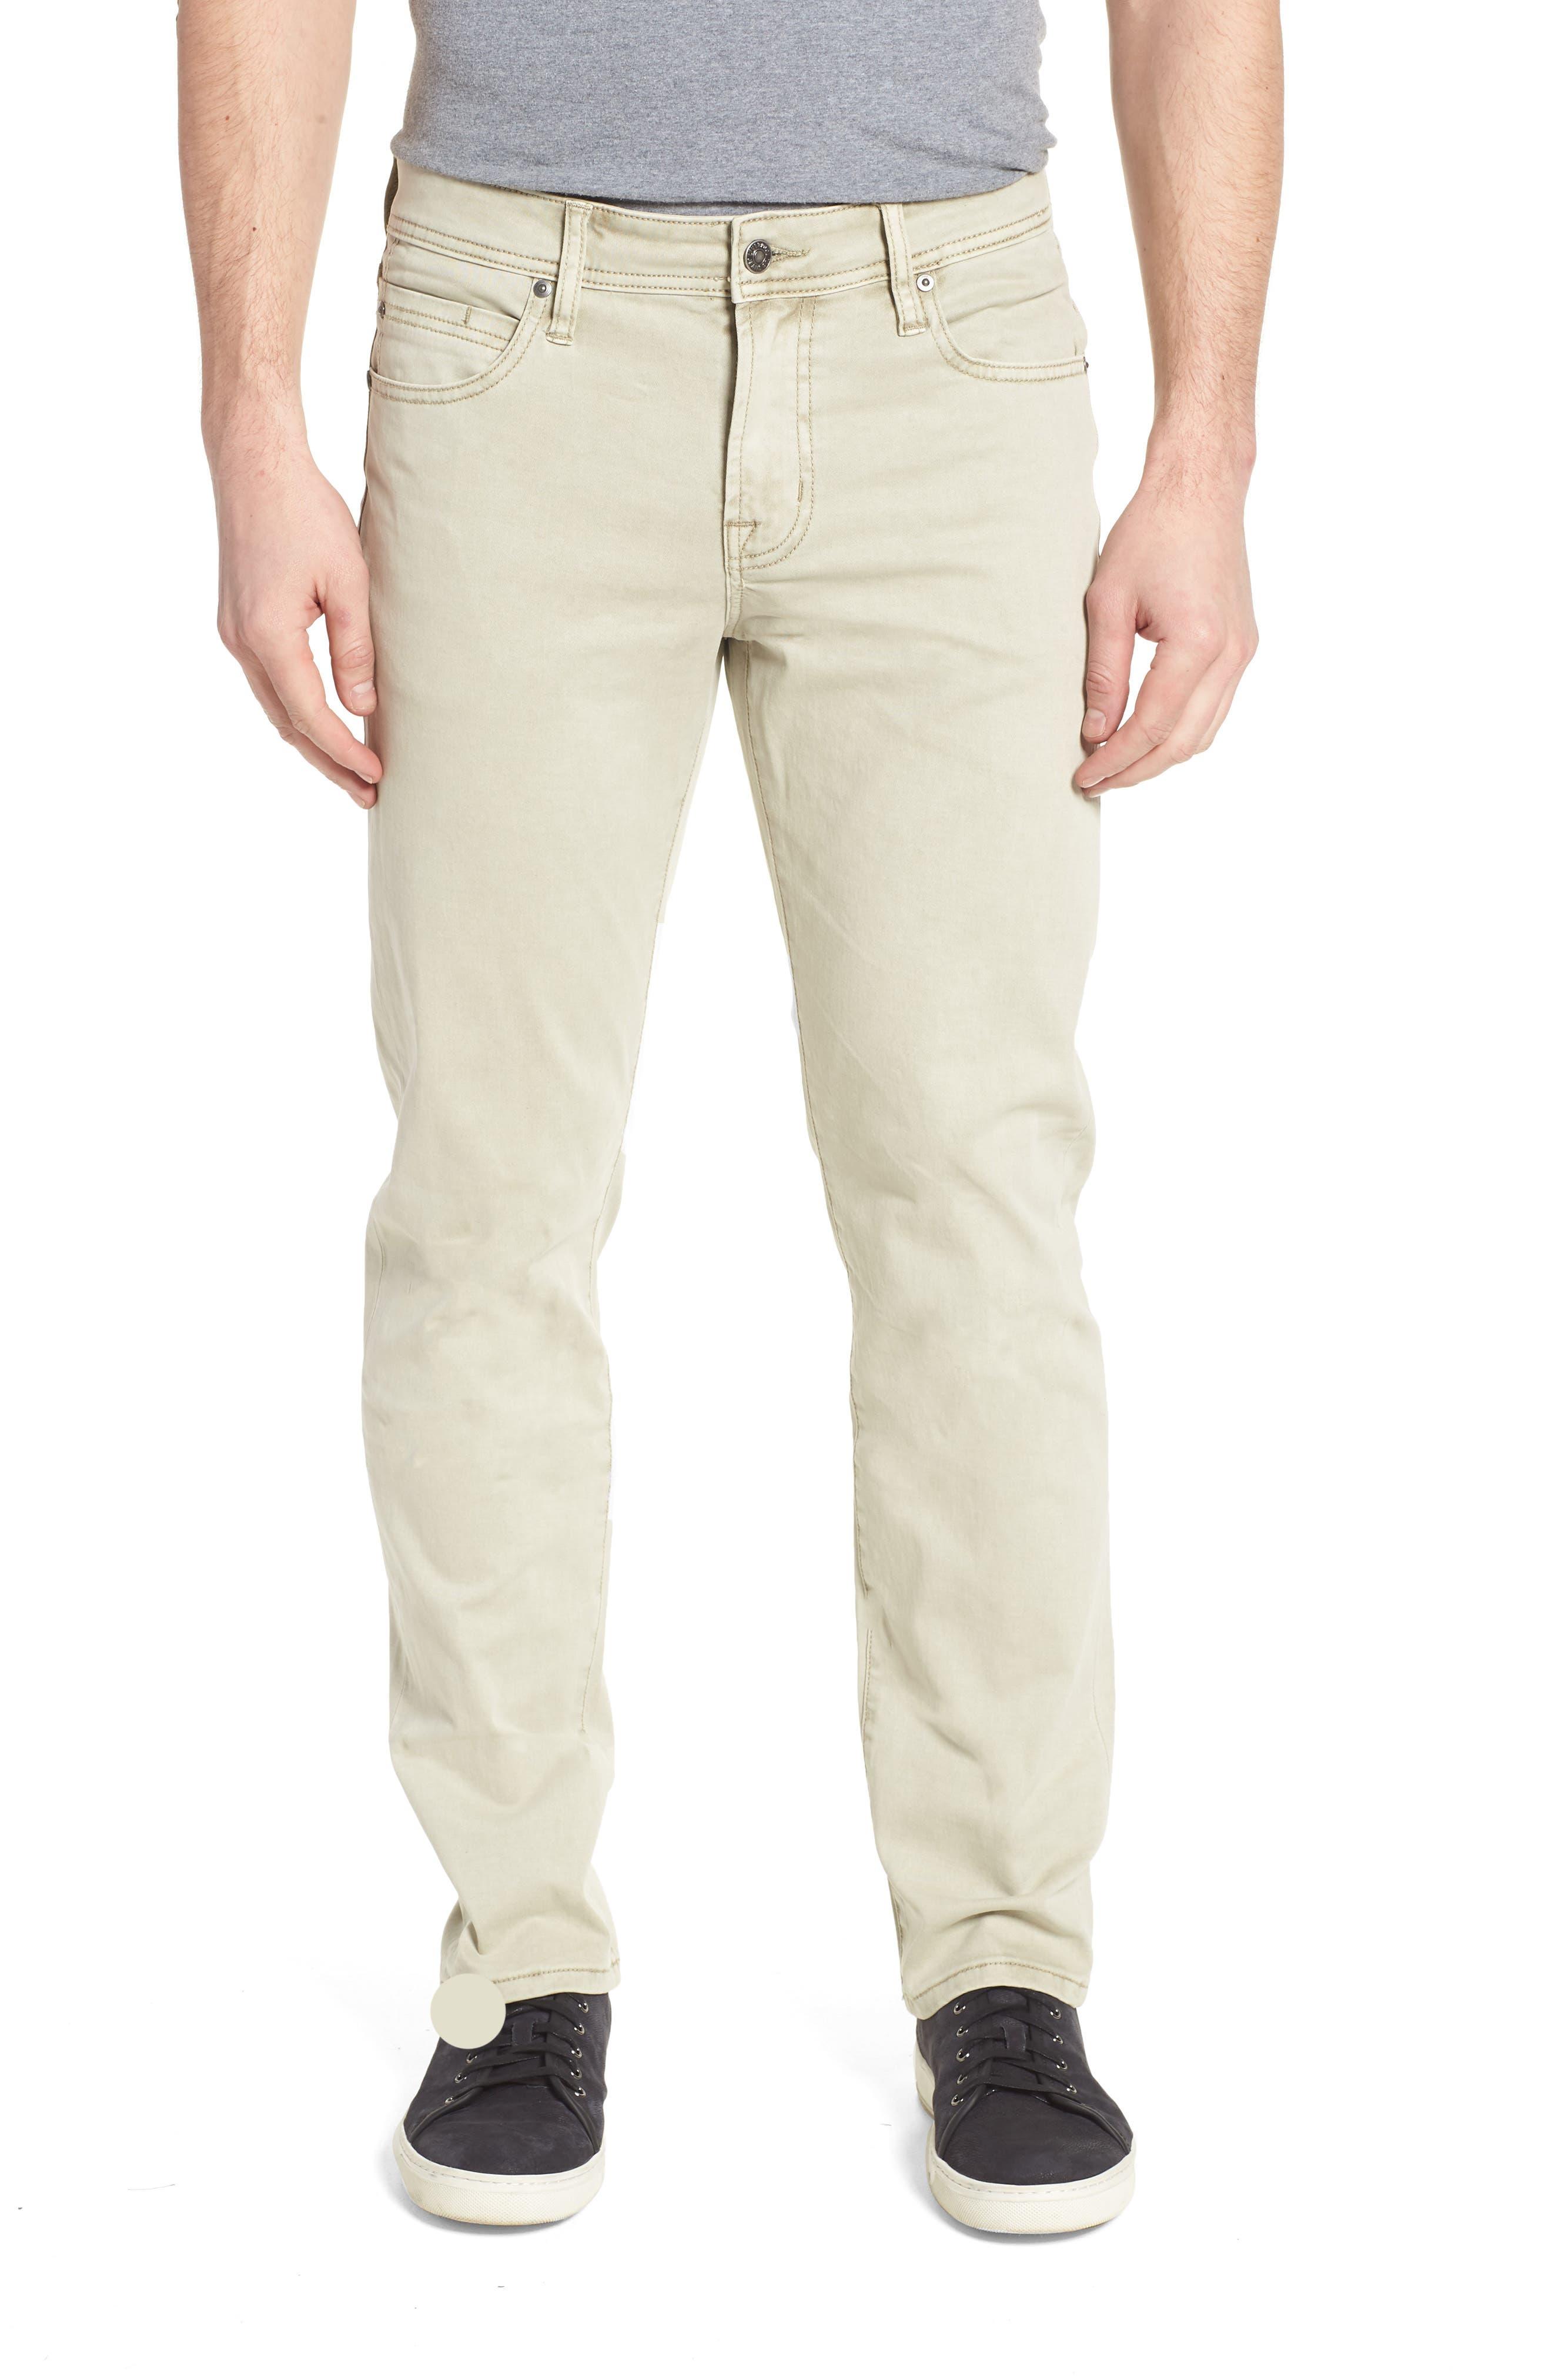 Liverpool Jeans Co. Straight Leg Jeans (Sandstorm)